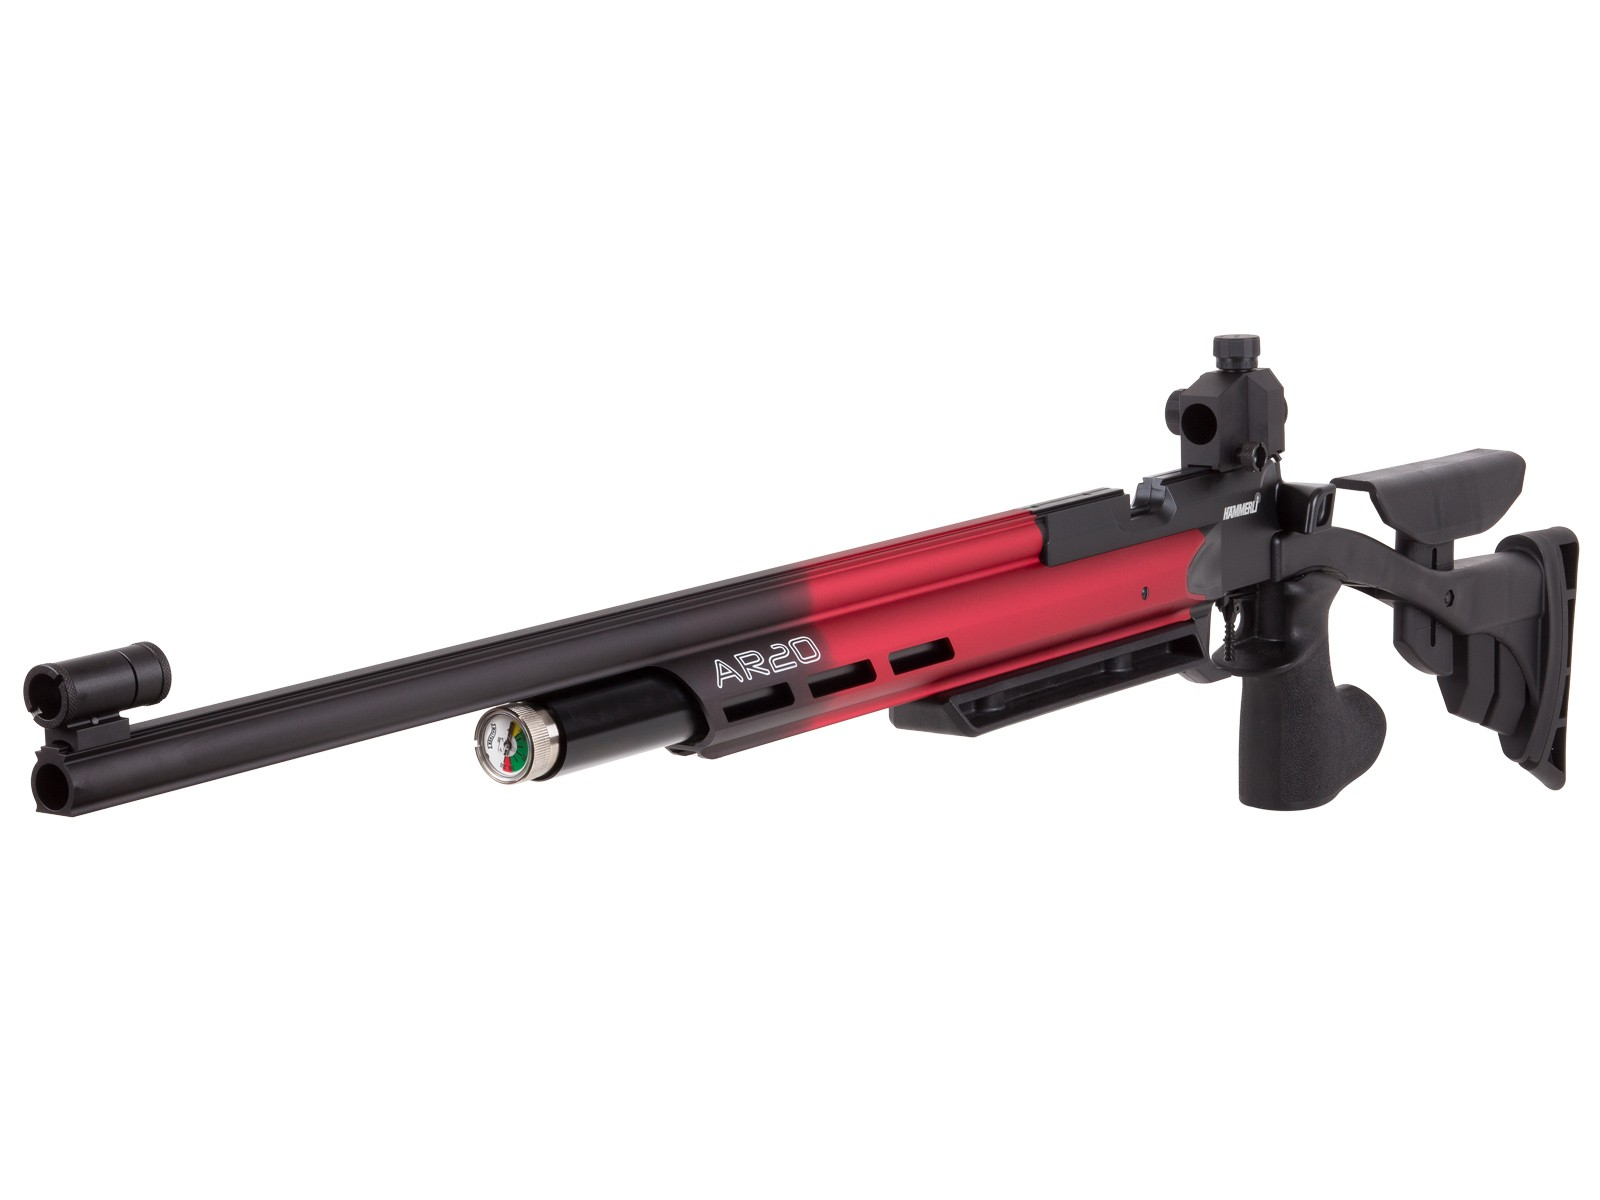 Hammerli AR20 Pro Air Rifle, Hot Red